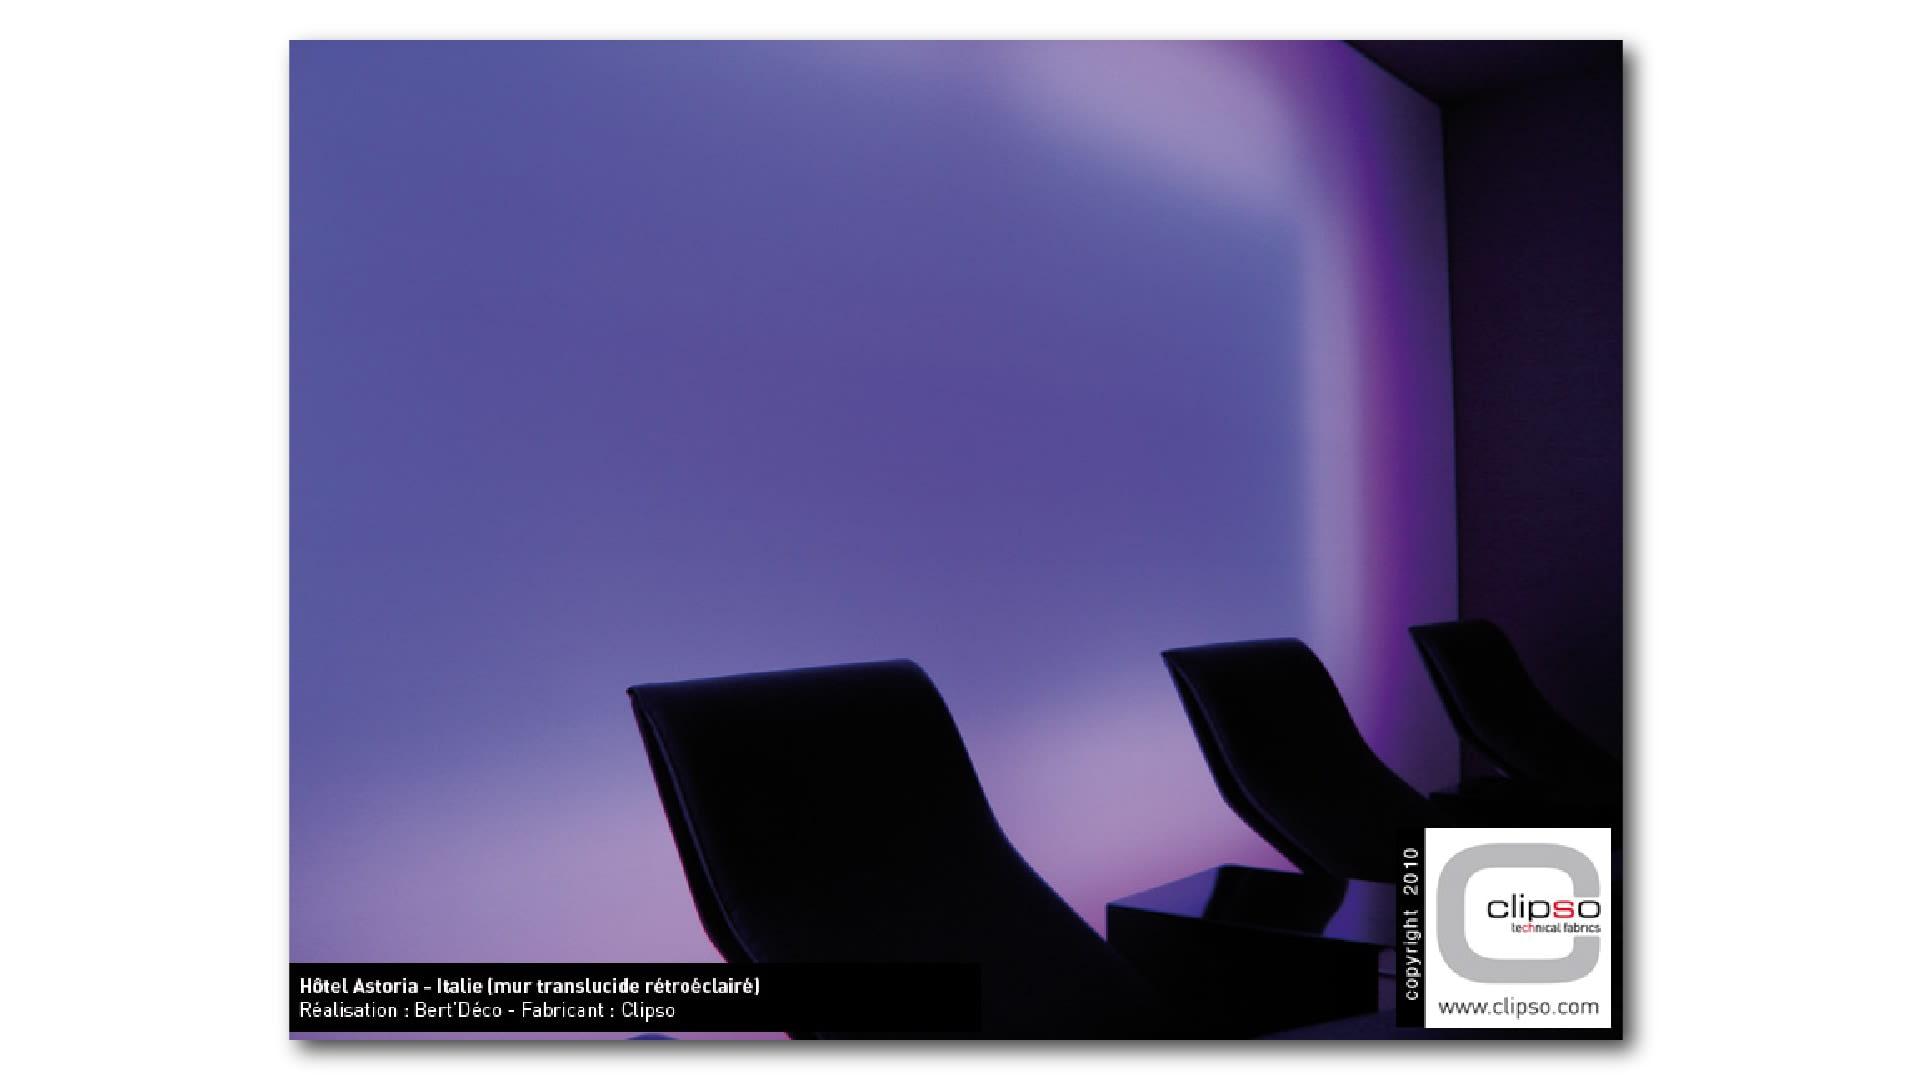 lounge-1-relanxen-lichtdusche-wellness-clipso-transluzent-01_w1vbqv